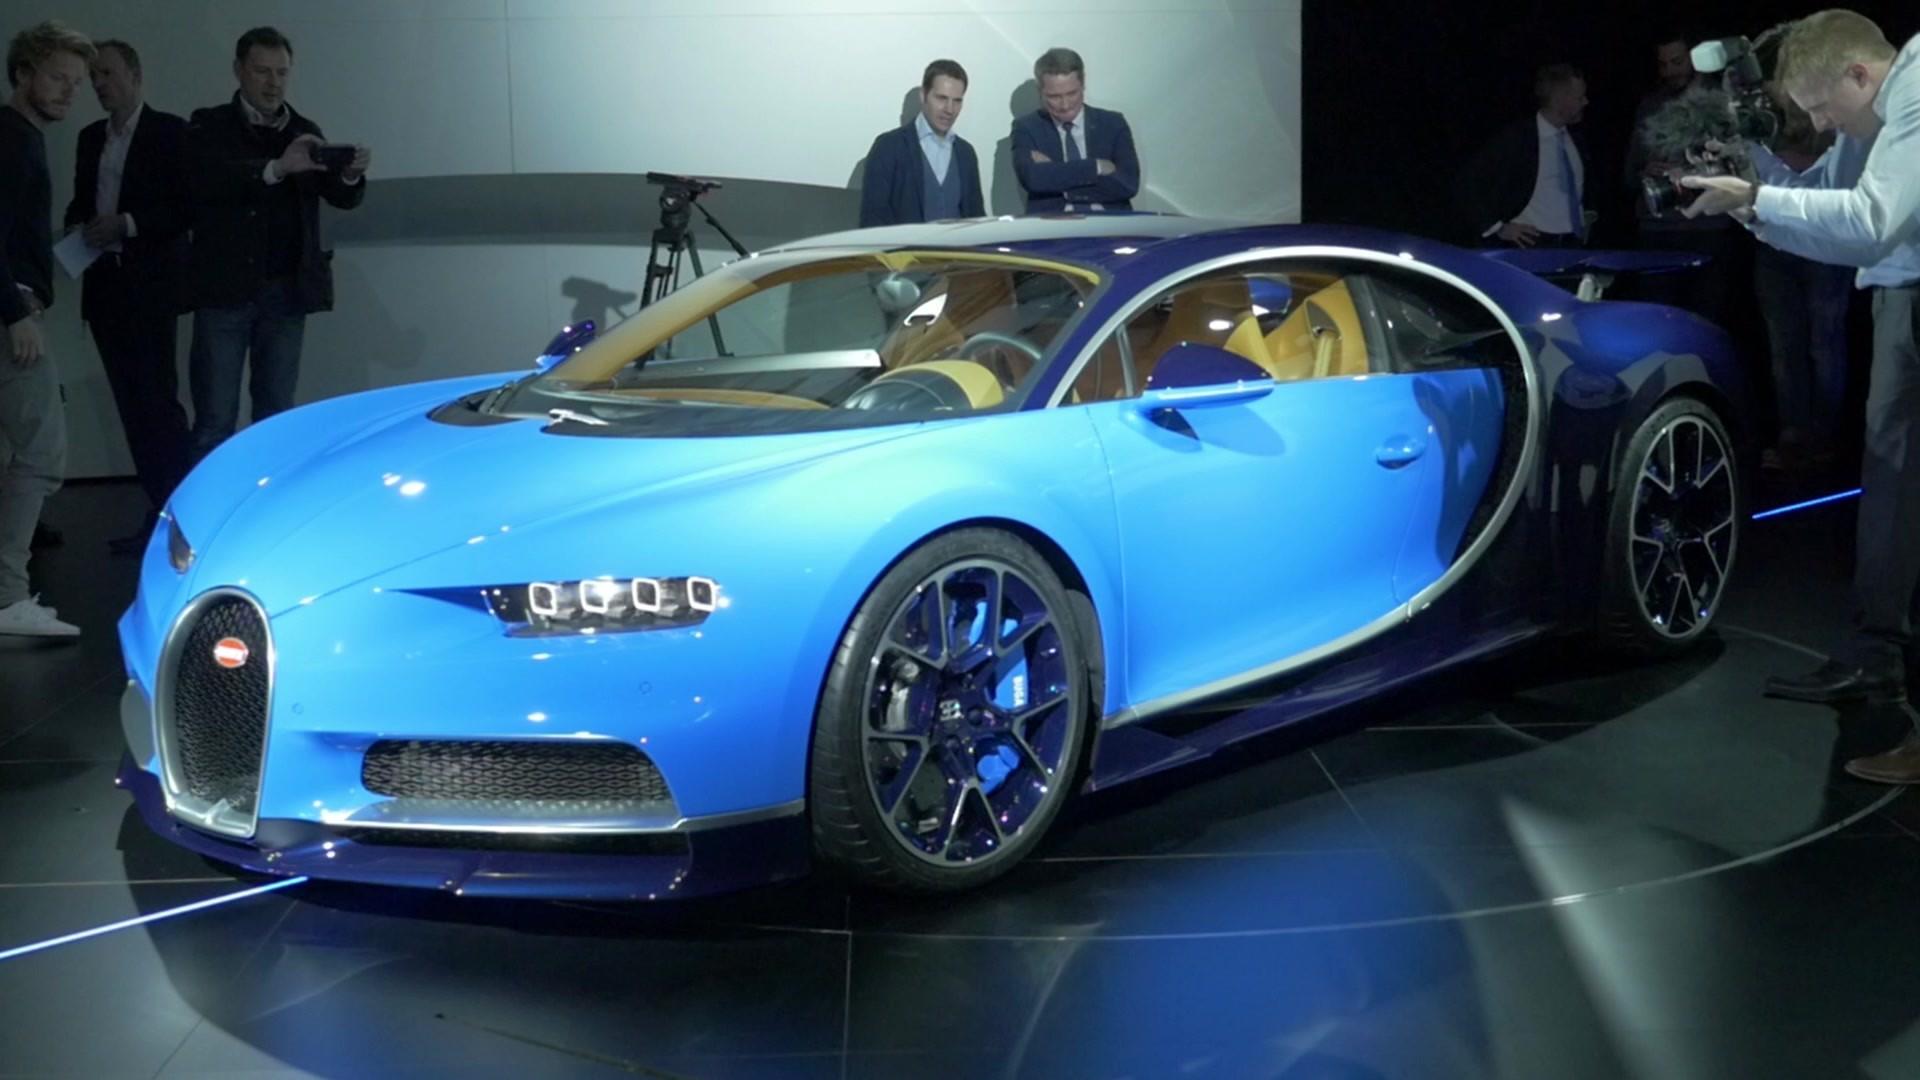 Bugatti Veyron Engine Diagram Hennessey F5 1 600 Horsepower Twin Turbo V8 Revealed Autoblog Of Bugatti Veyron Engine Diagram